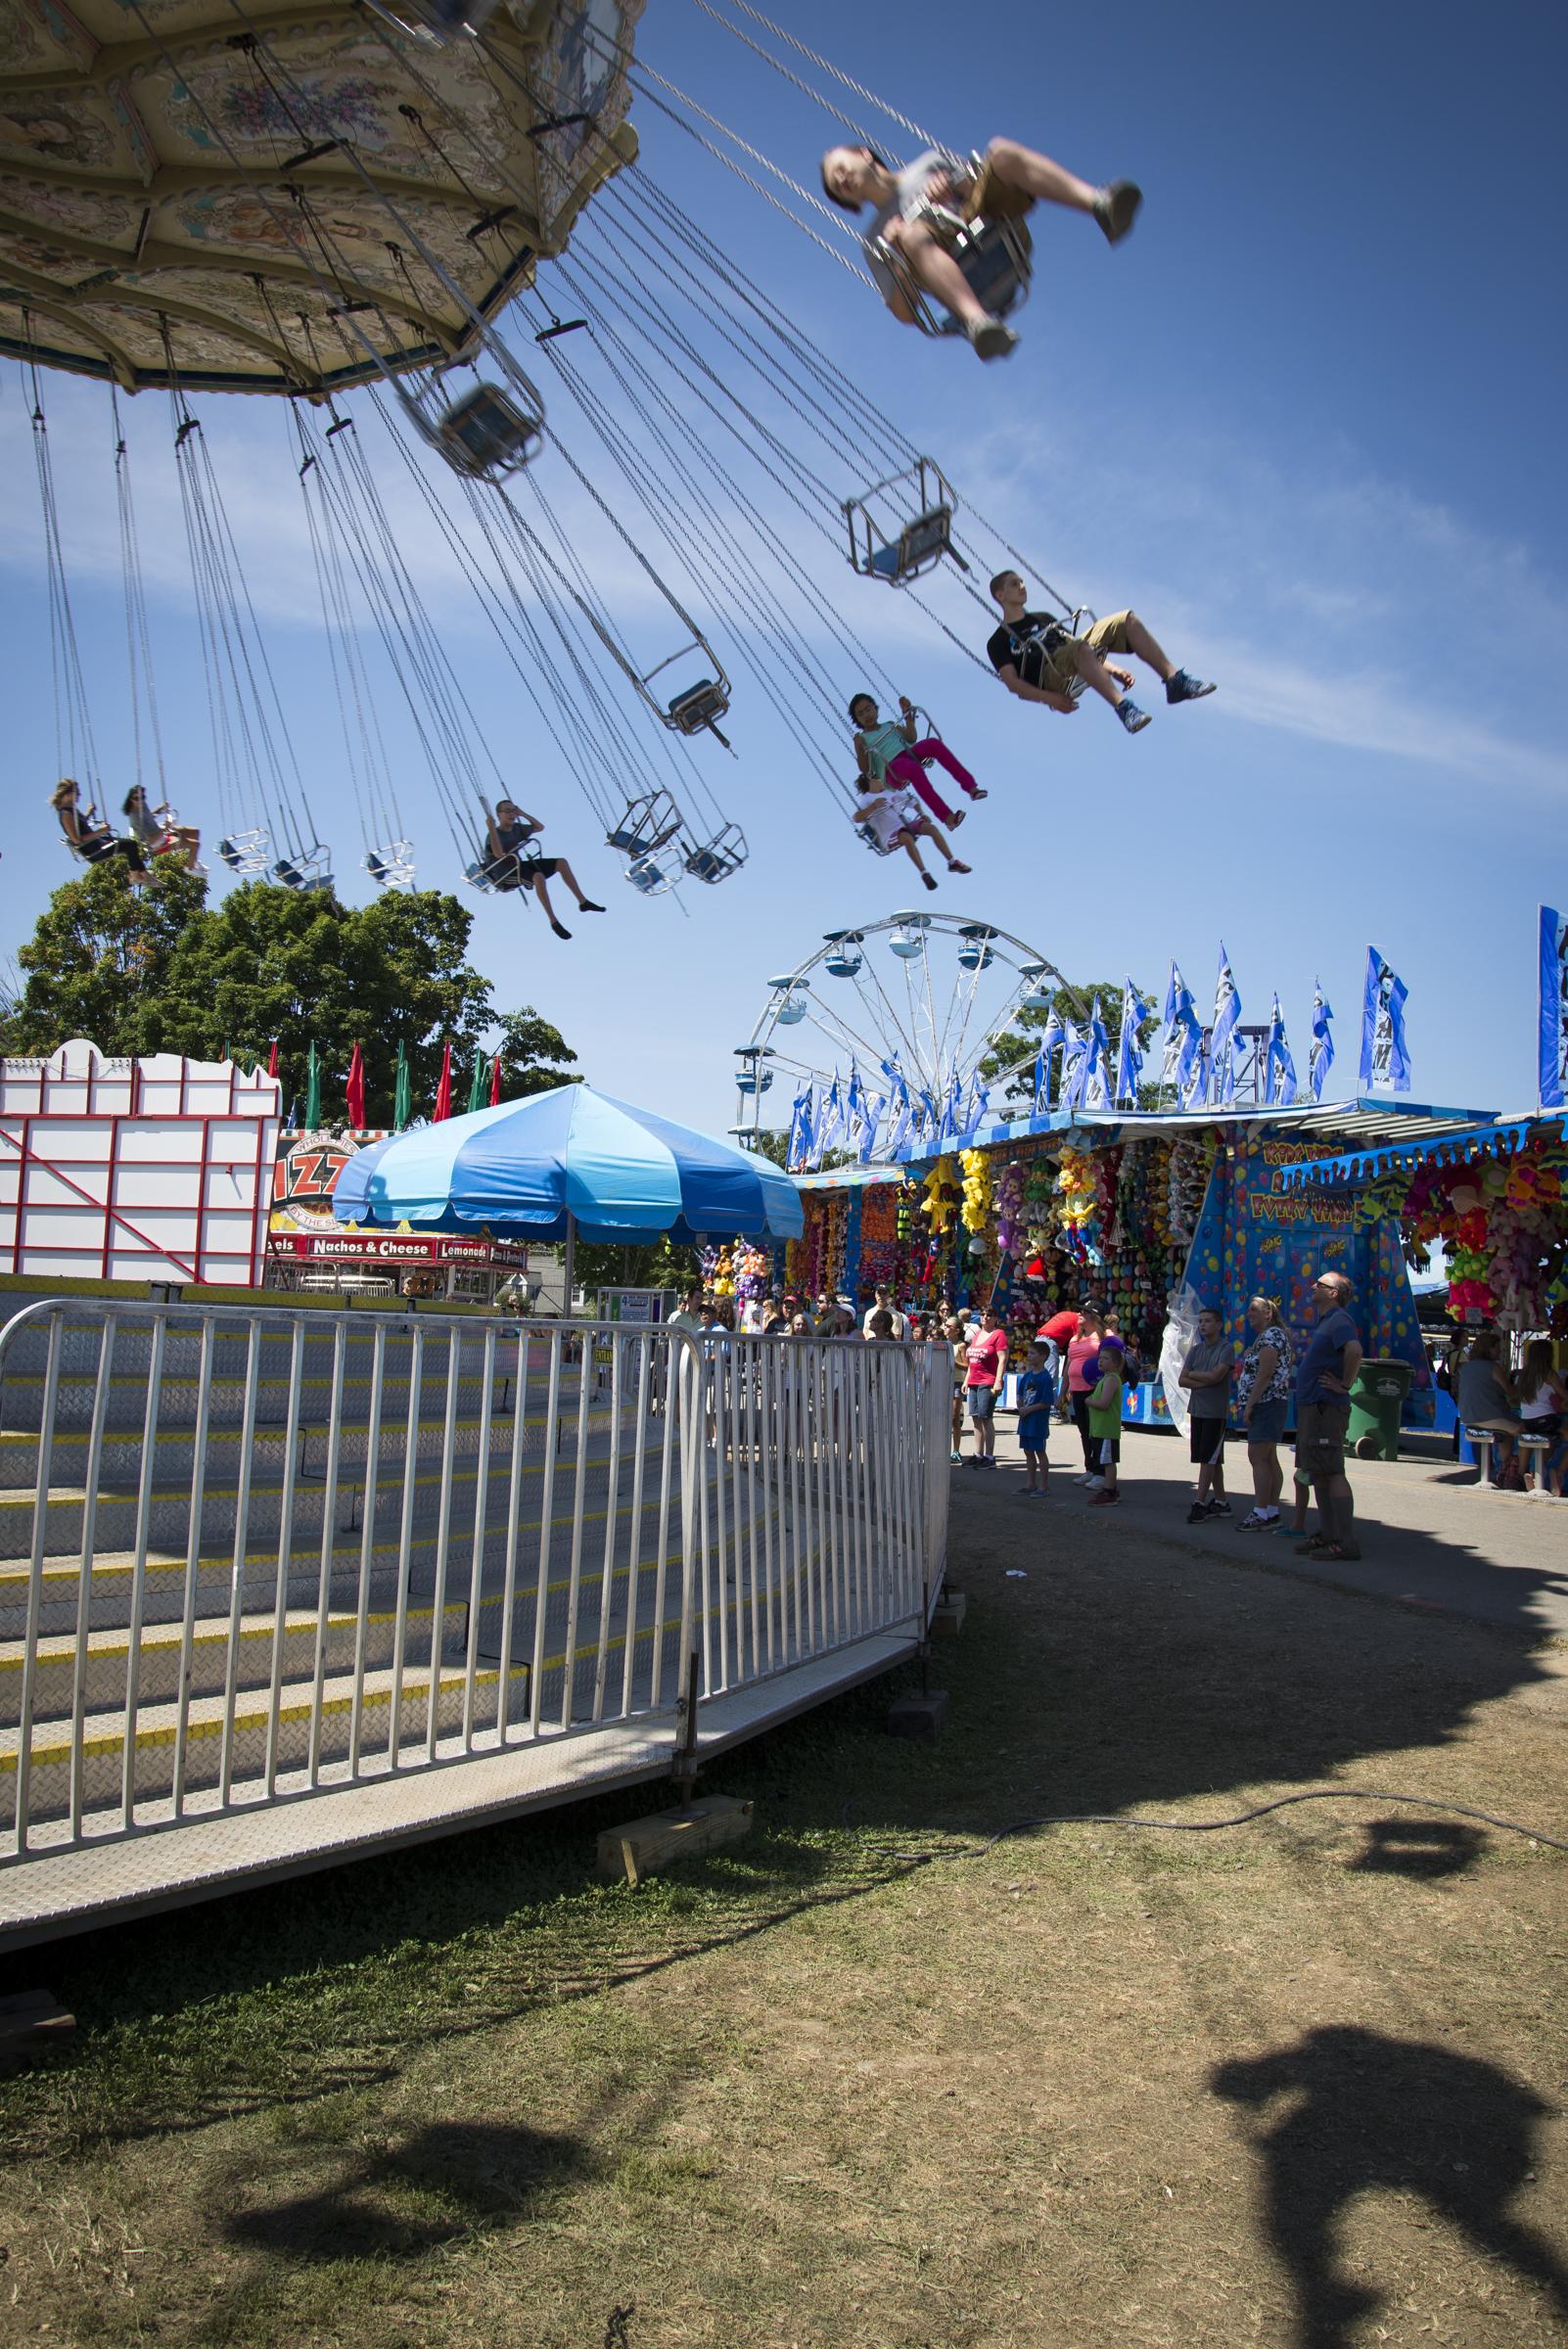 08252013-CarnivalScene-JuliaLuckettPhotography-5